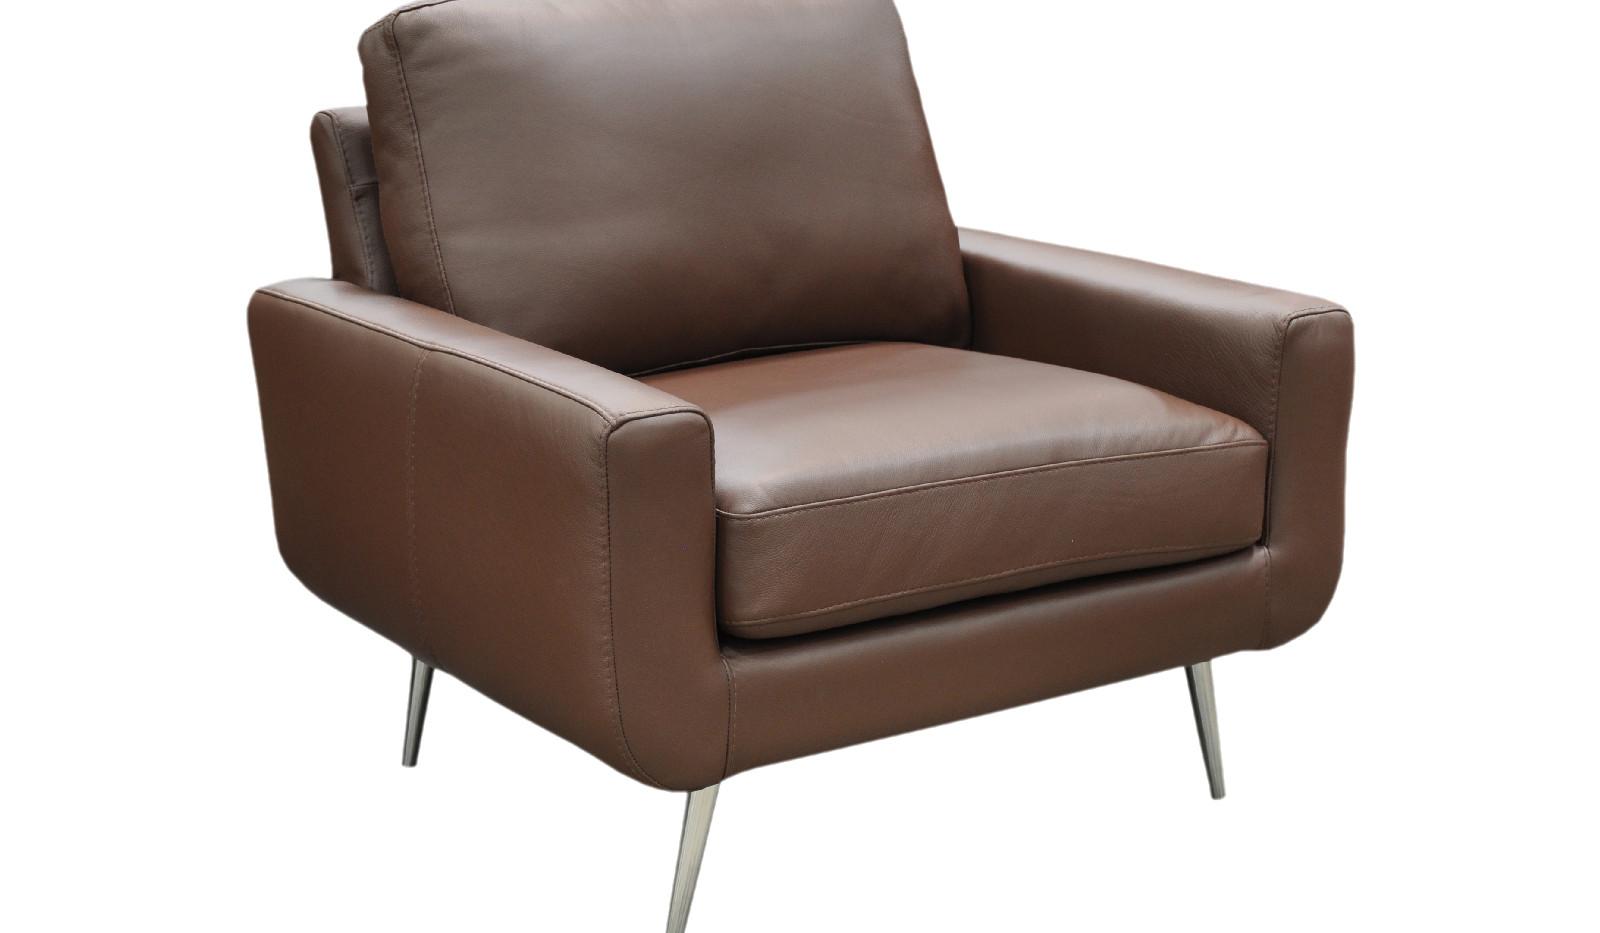 Harvey-Chair-Softsations-Mocha-Angled-SL